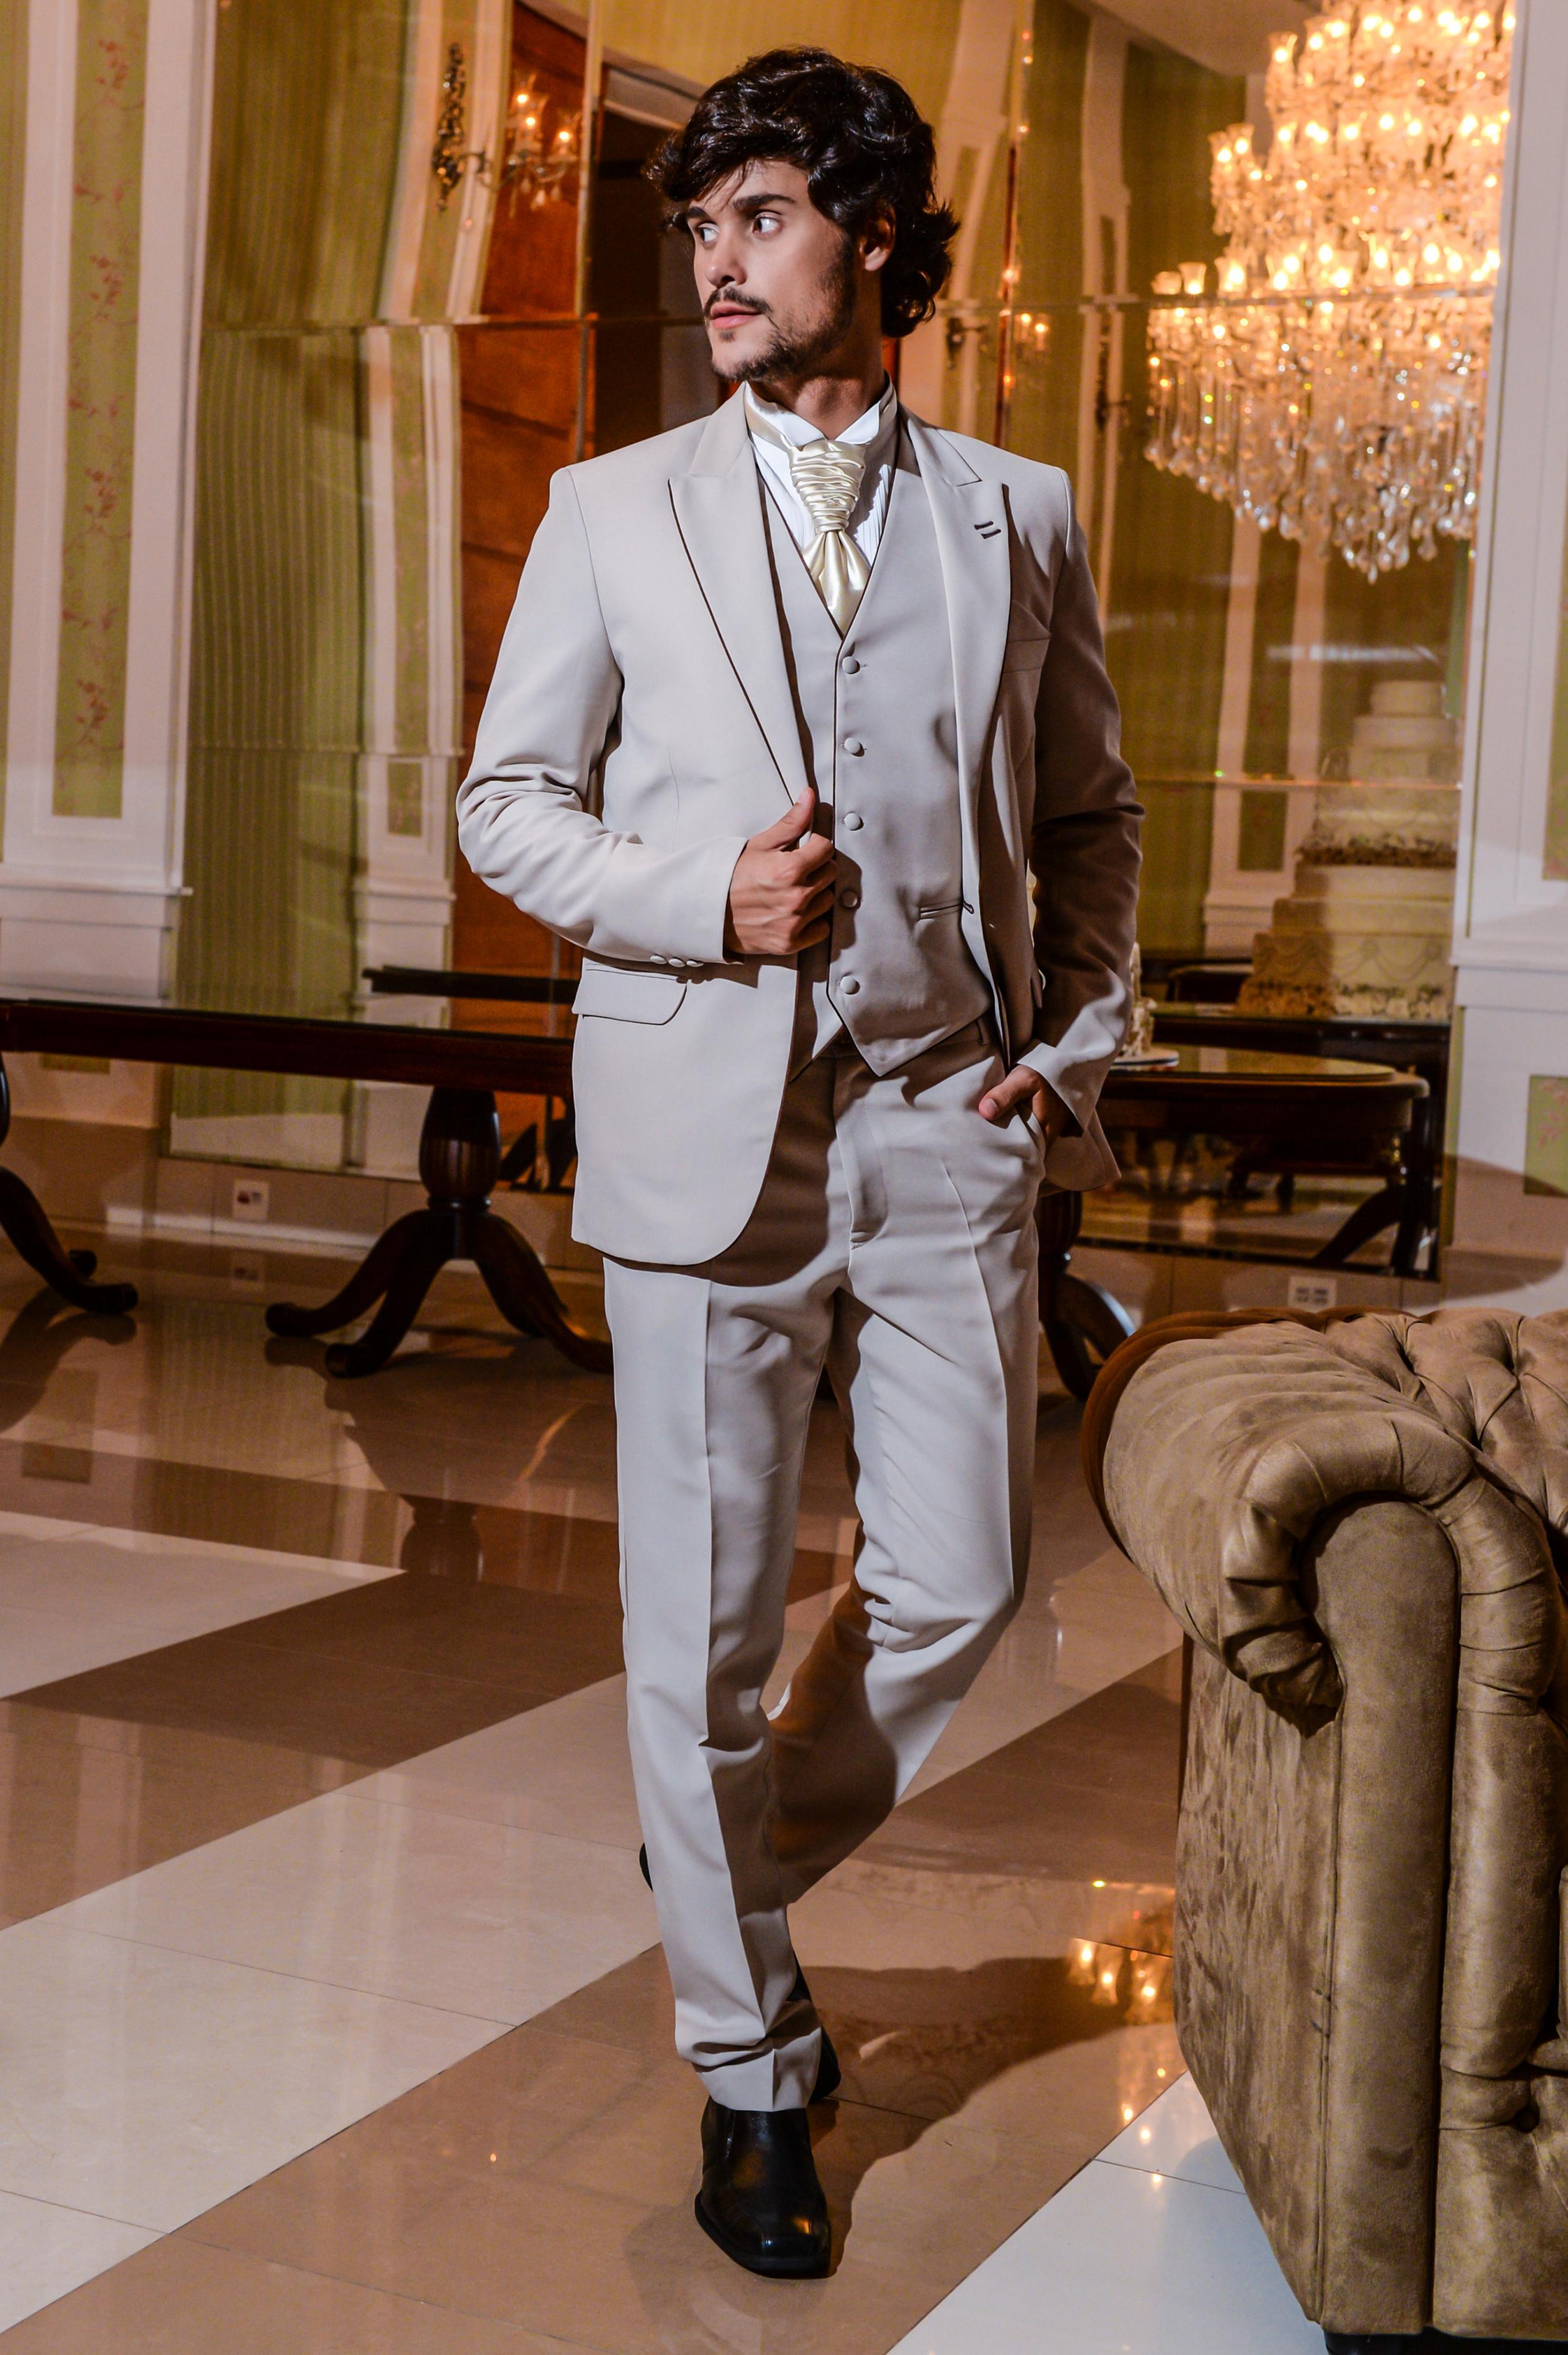 52 - Terno bege slim com colete e camisa branca